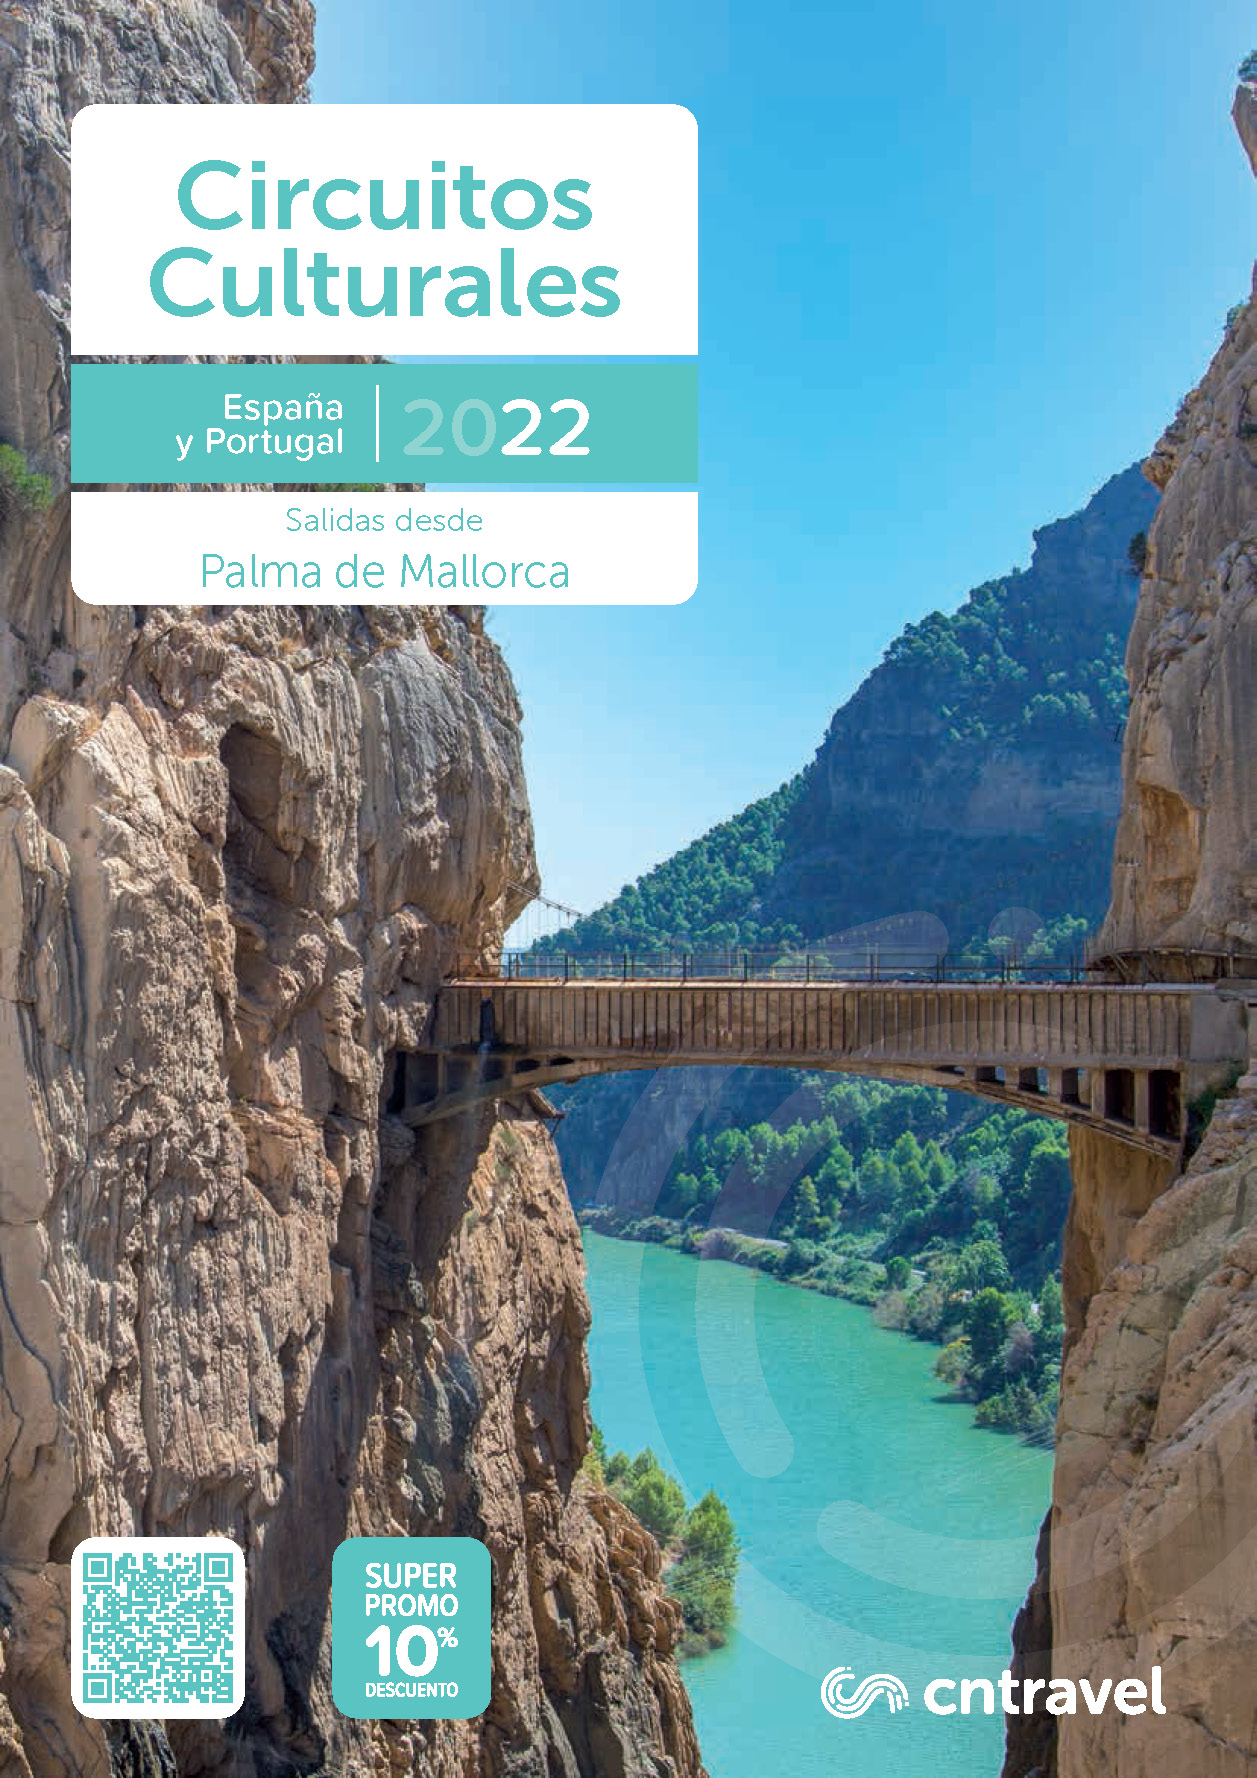 Catalogo CN Travel Circuitos Culturales 2022 Espana y Portugal salidas Palma de Mallorca